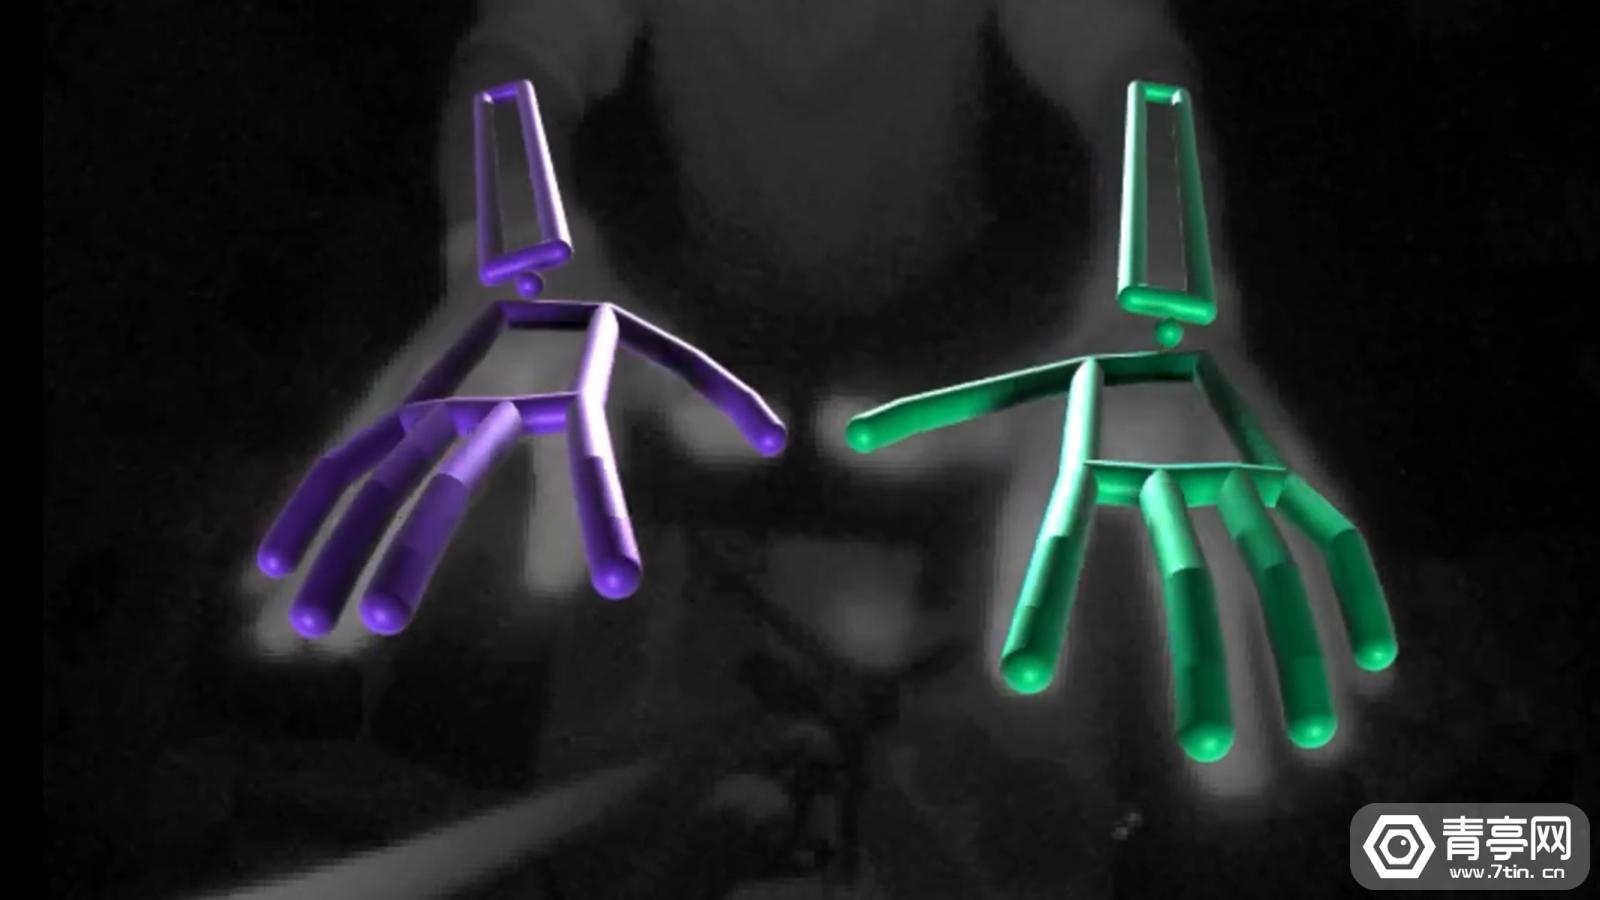 Ultraleap:用红外光追踪手势有哪些优势?